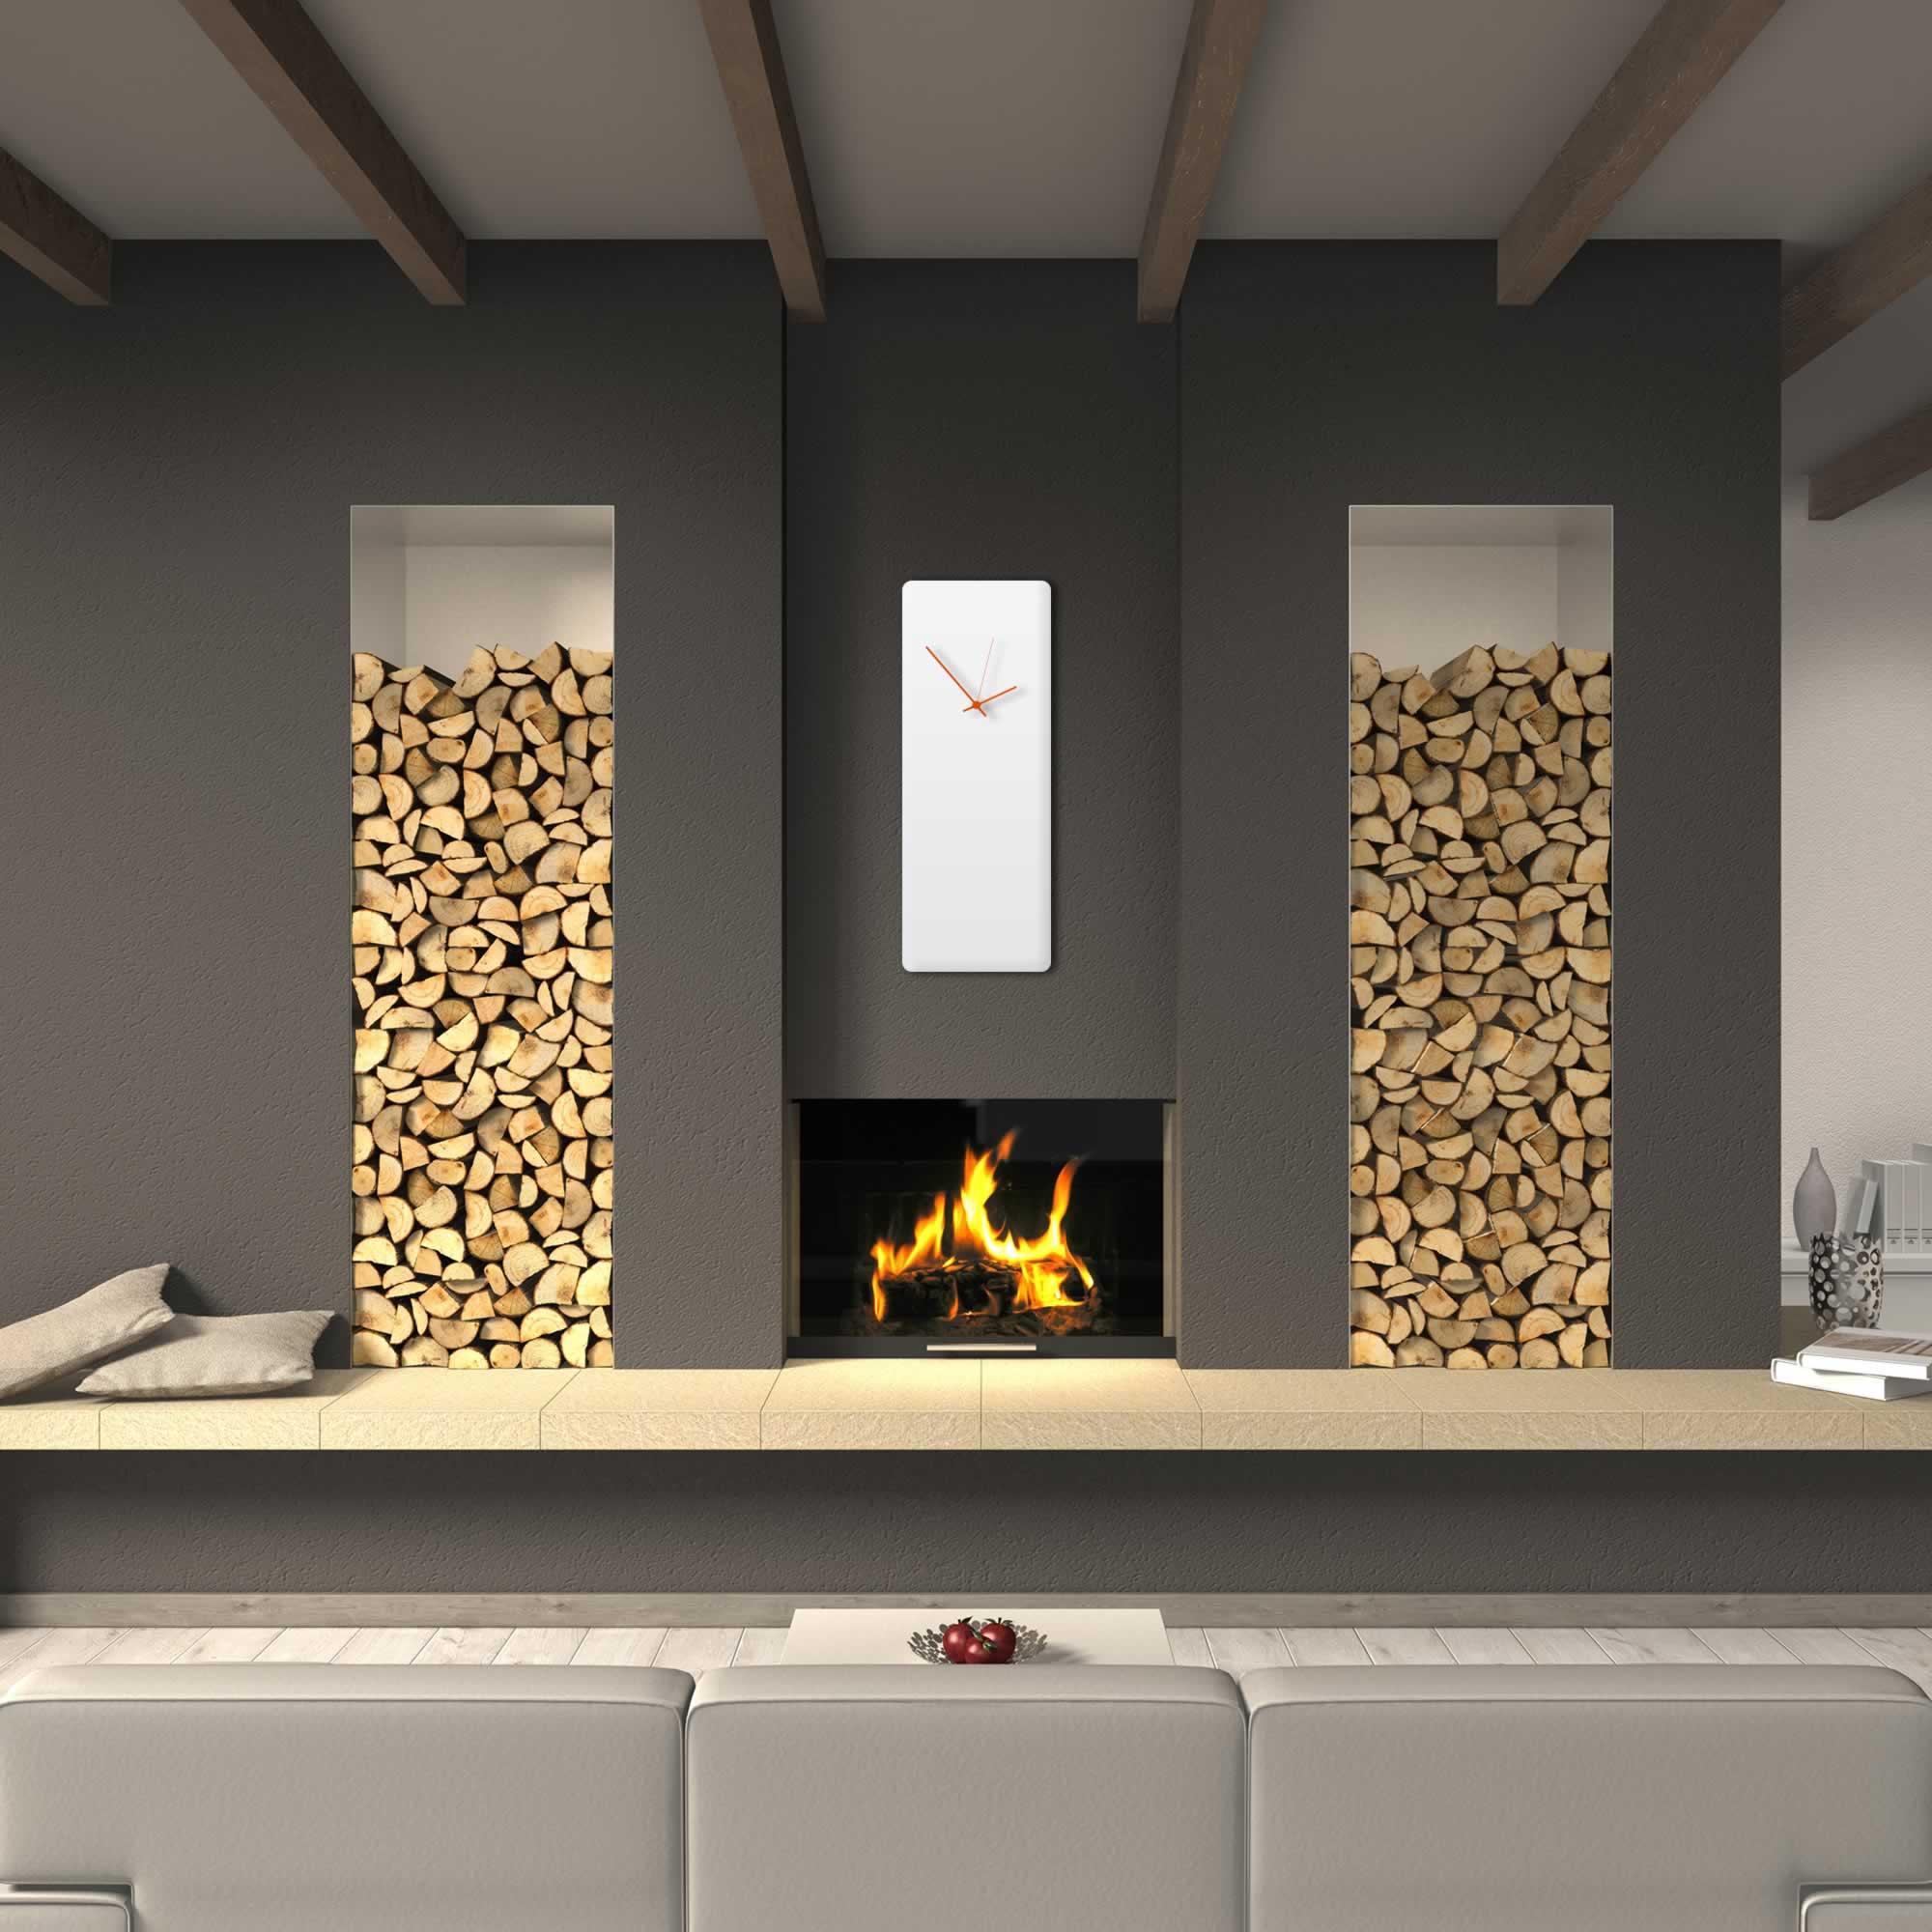 Whiteout Orange Wall Clock Large - Contemporary - Lifestyle Image